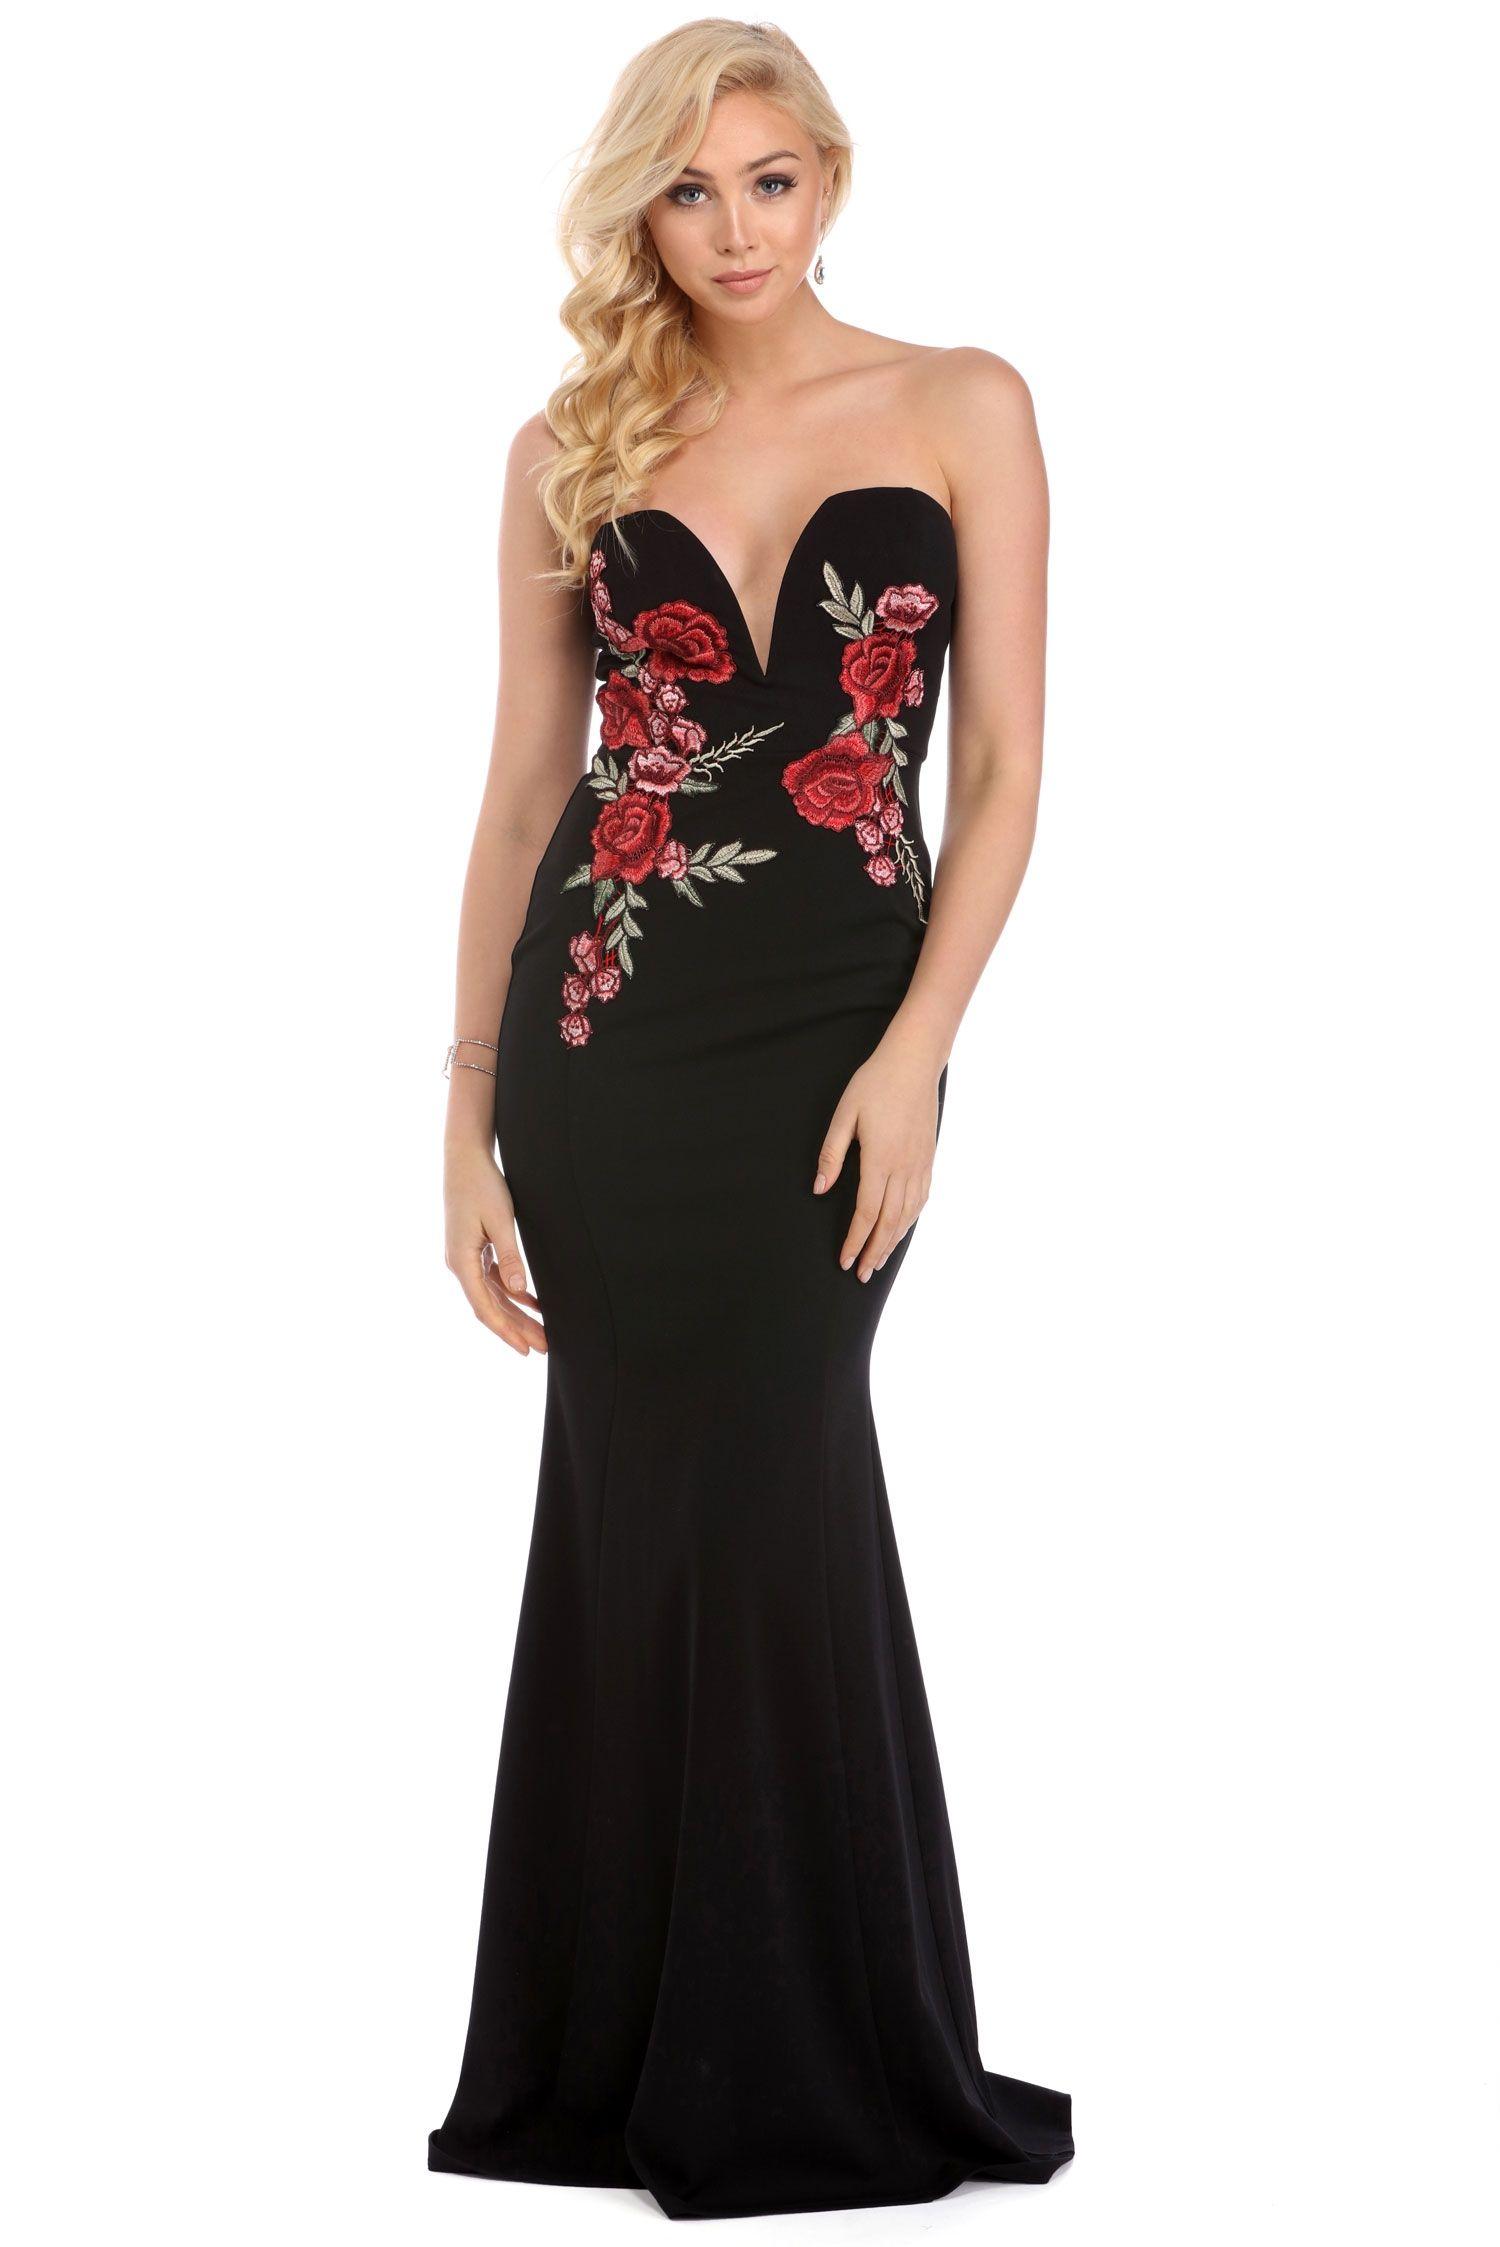 Rosa Black Rose Embroidered Dress Red Carpet Ready Pinterest